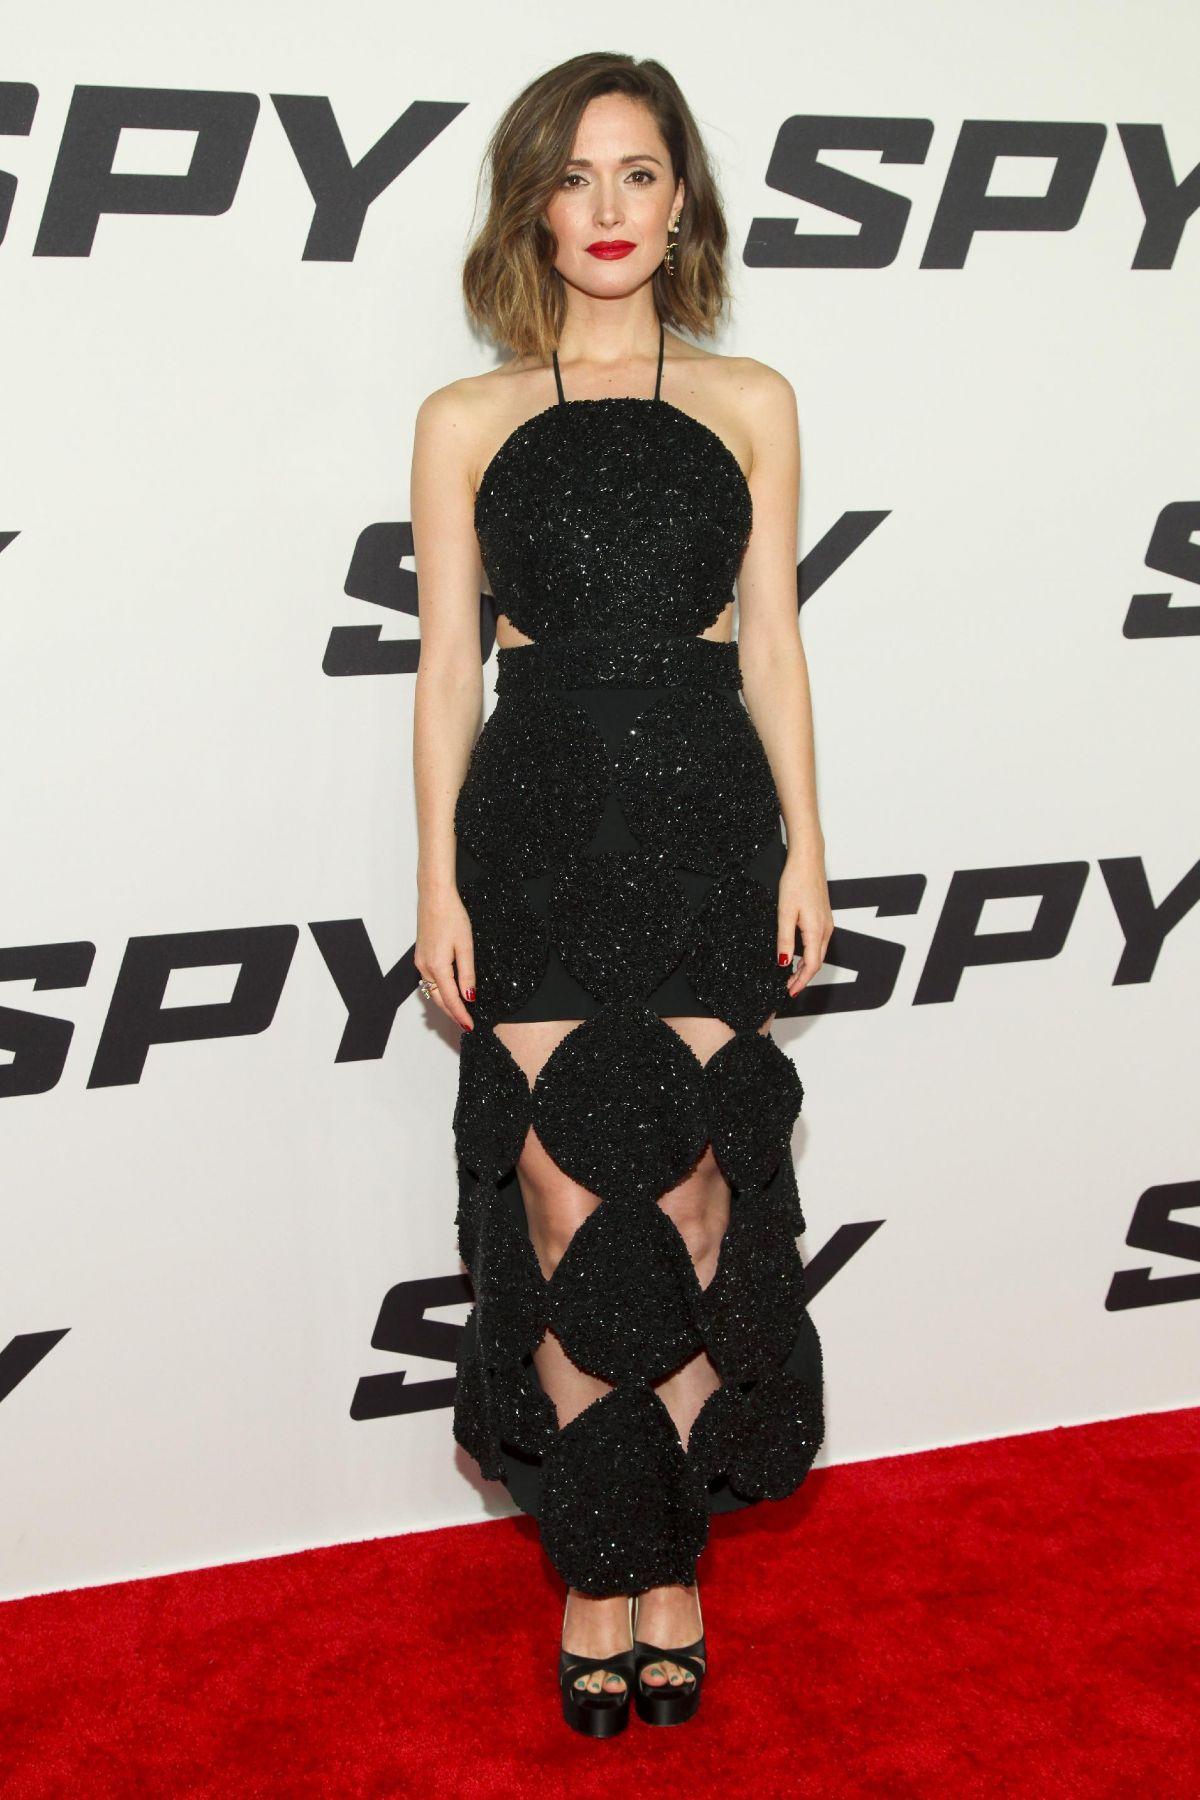 ROSE BYRNE at Spy Premiere in New York